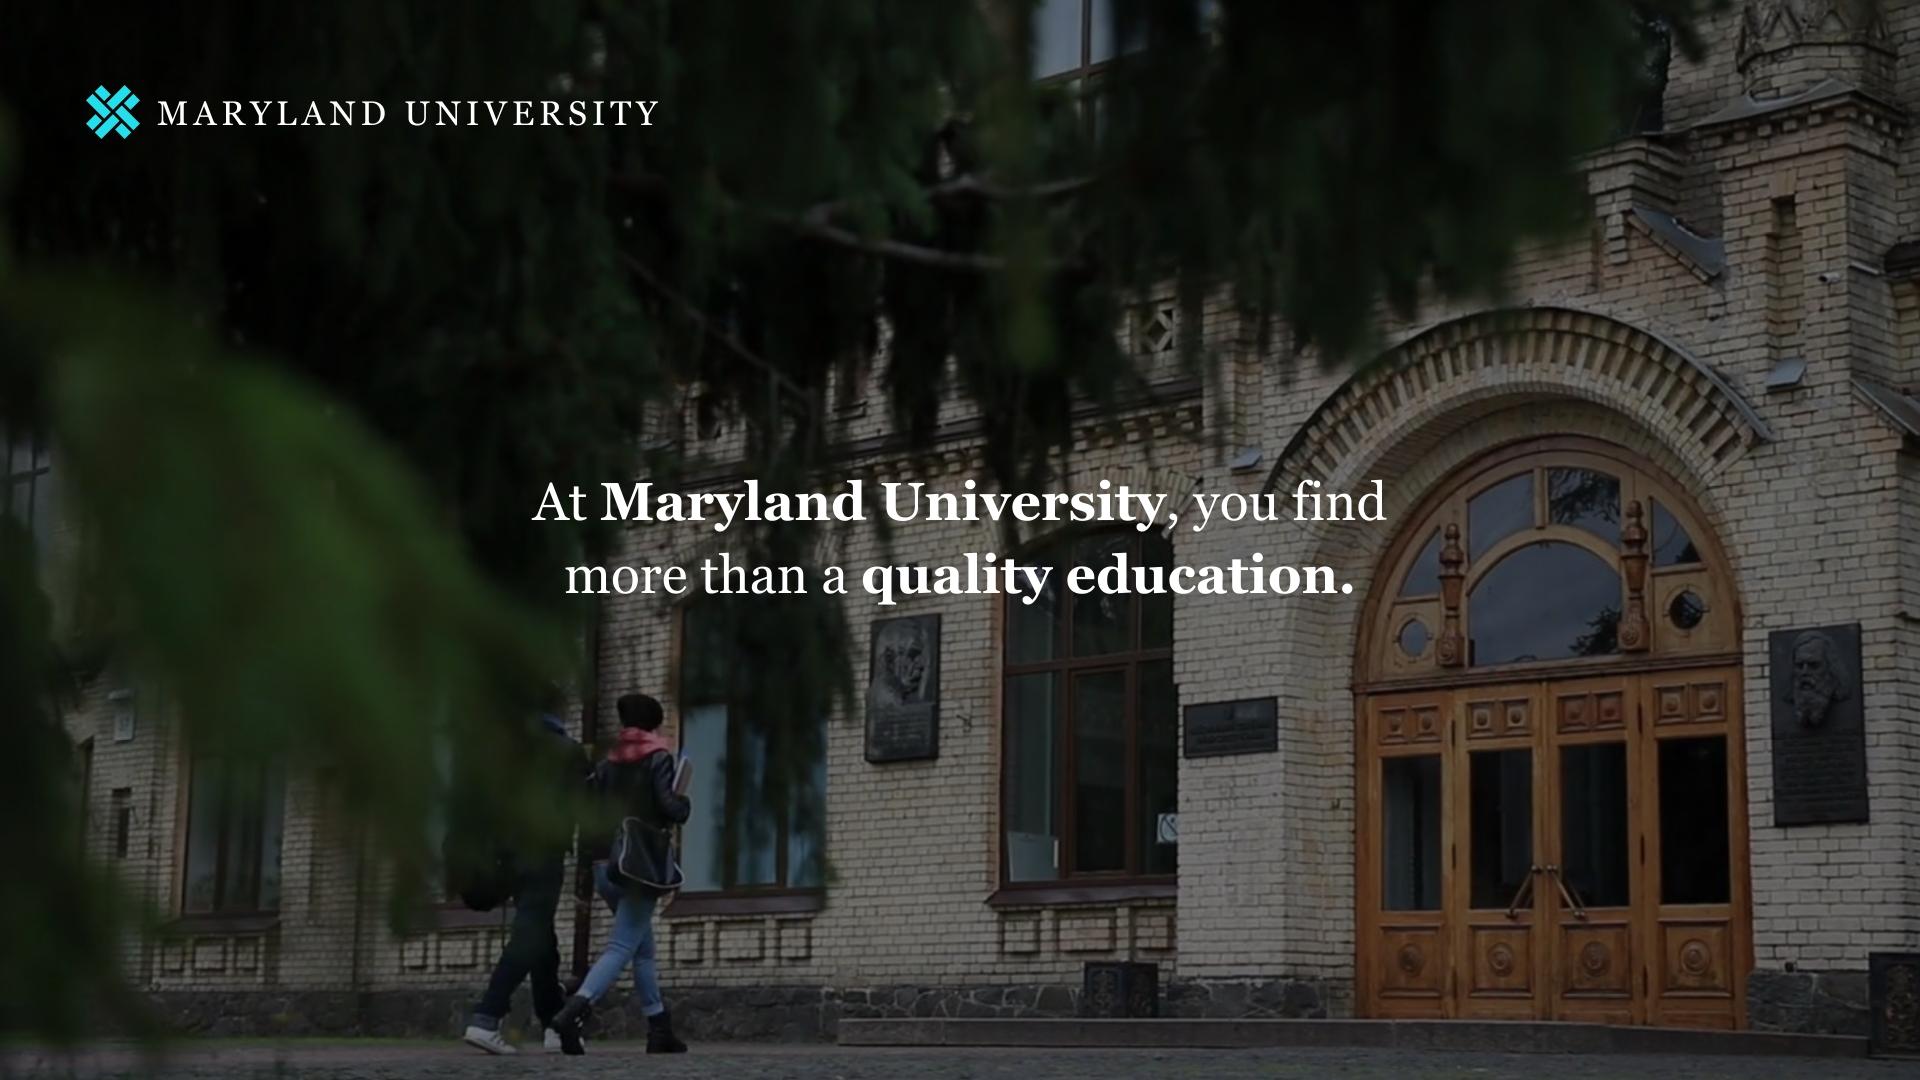 University Twitter Video Ad Template